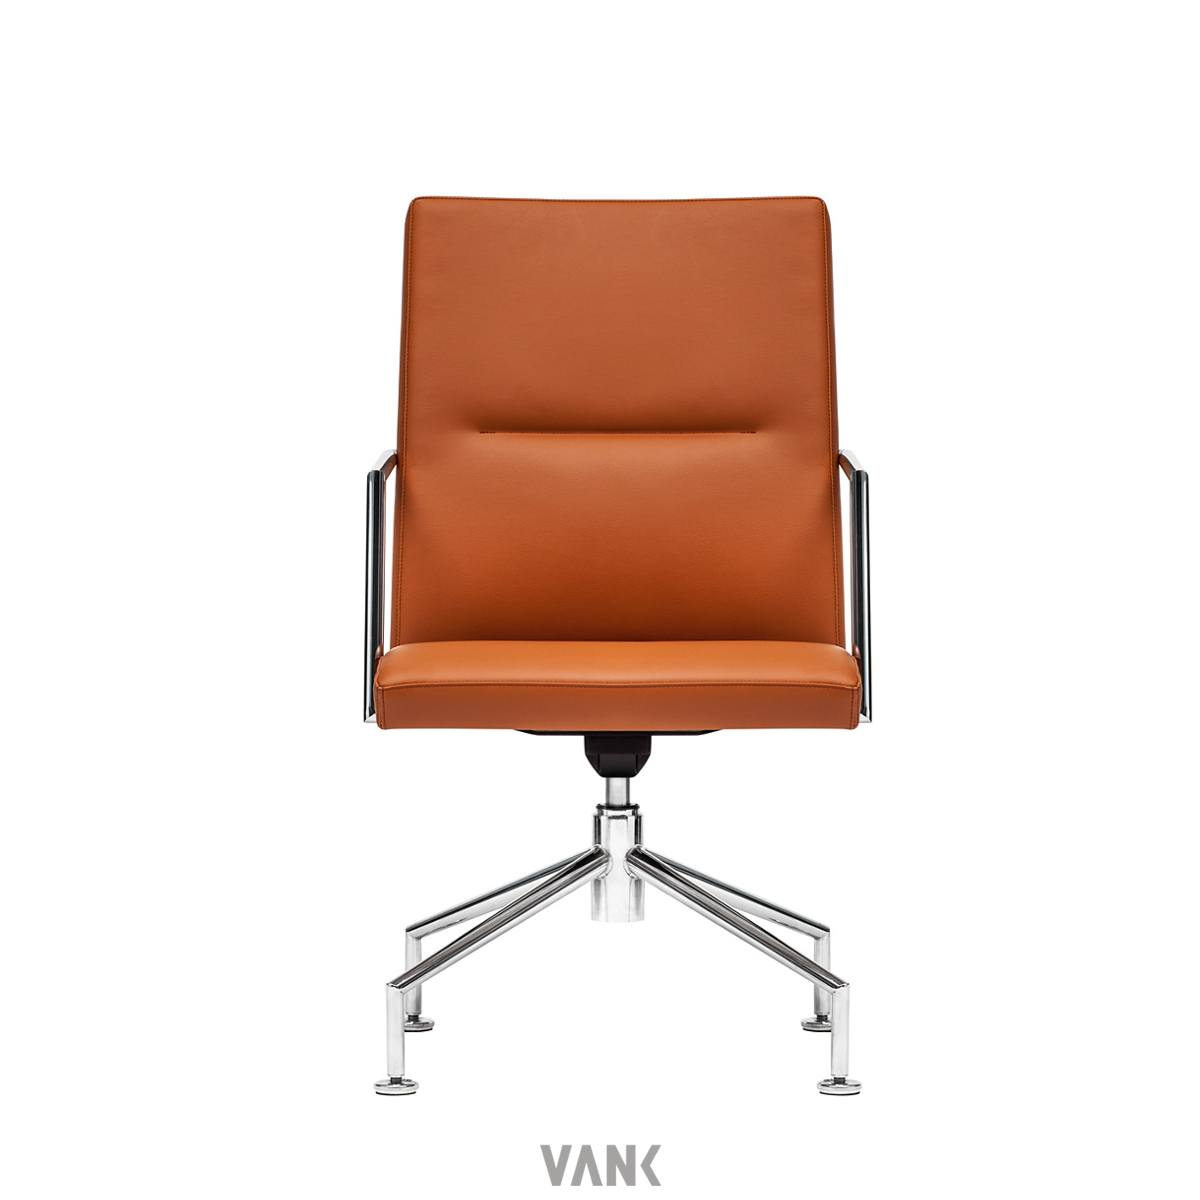 VANK-ranz (1)